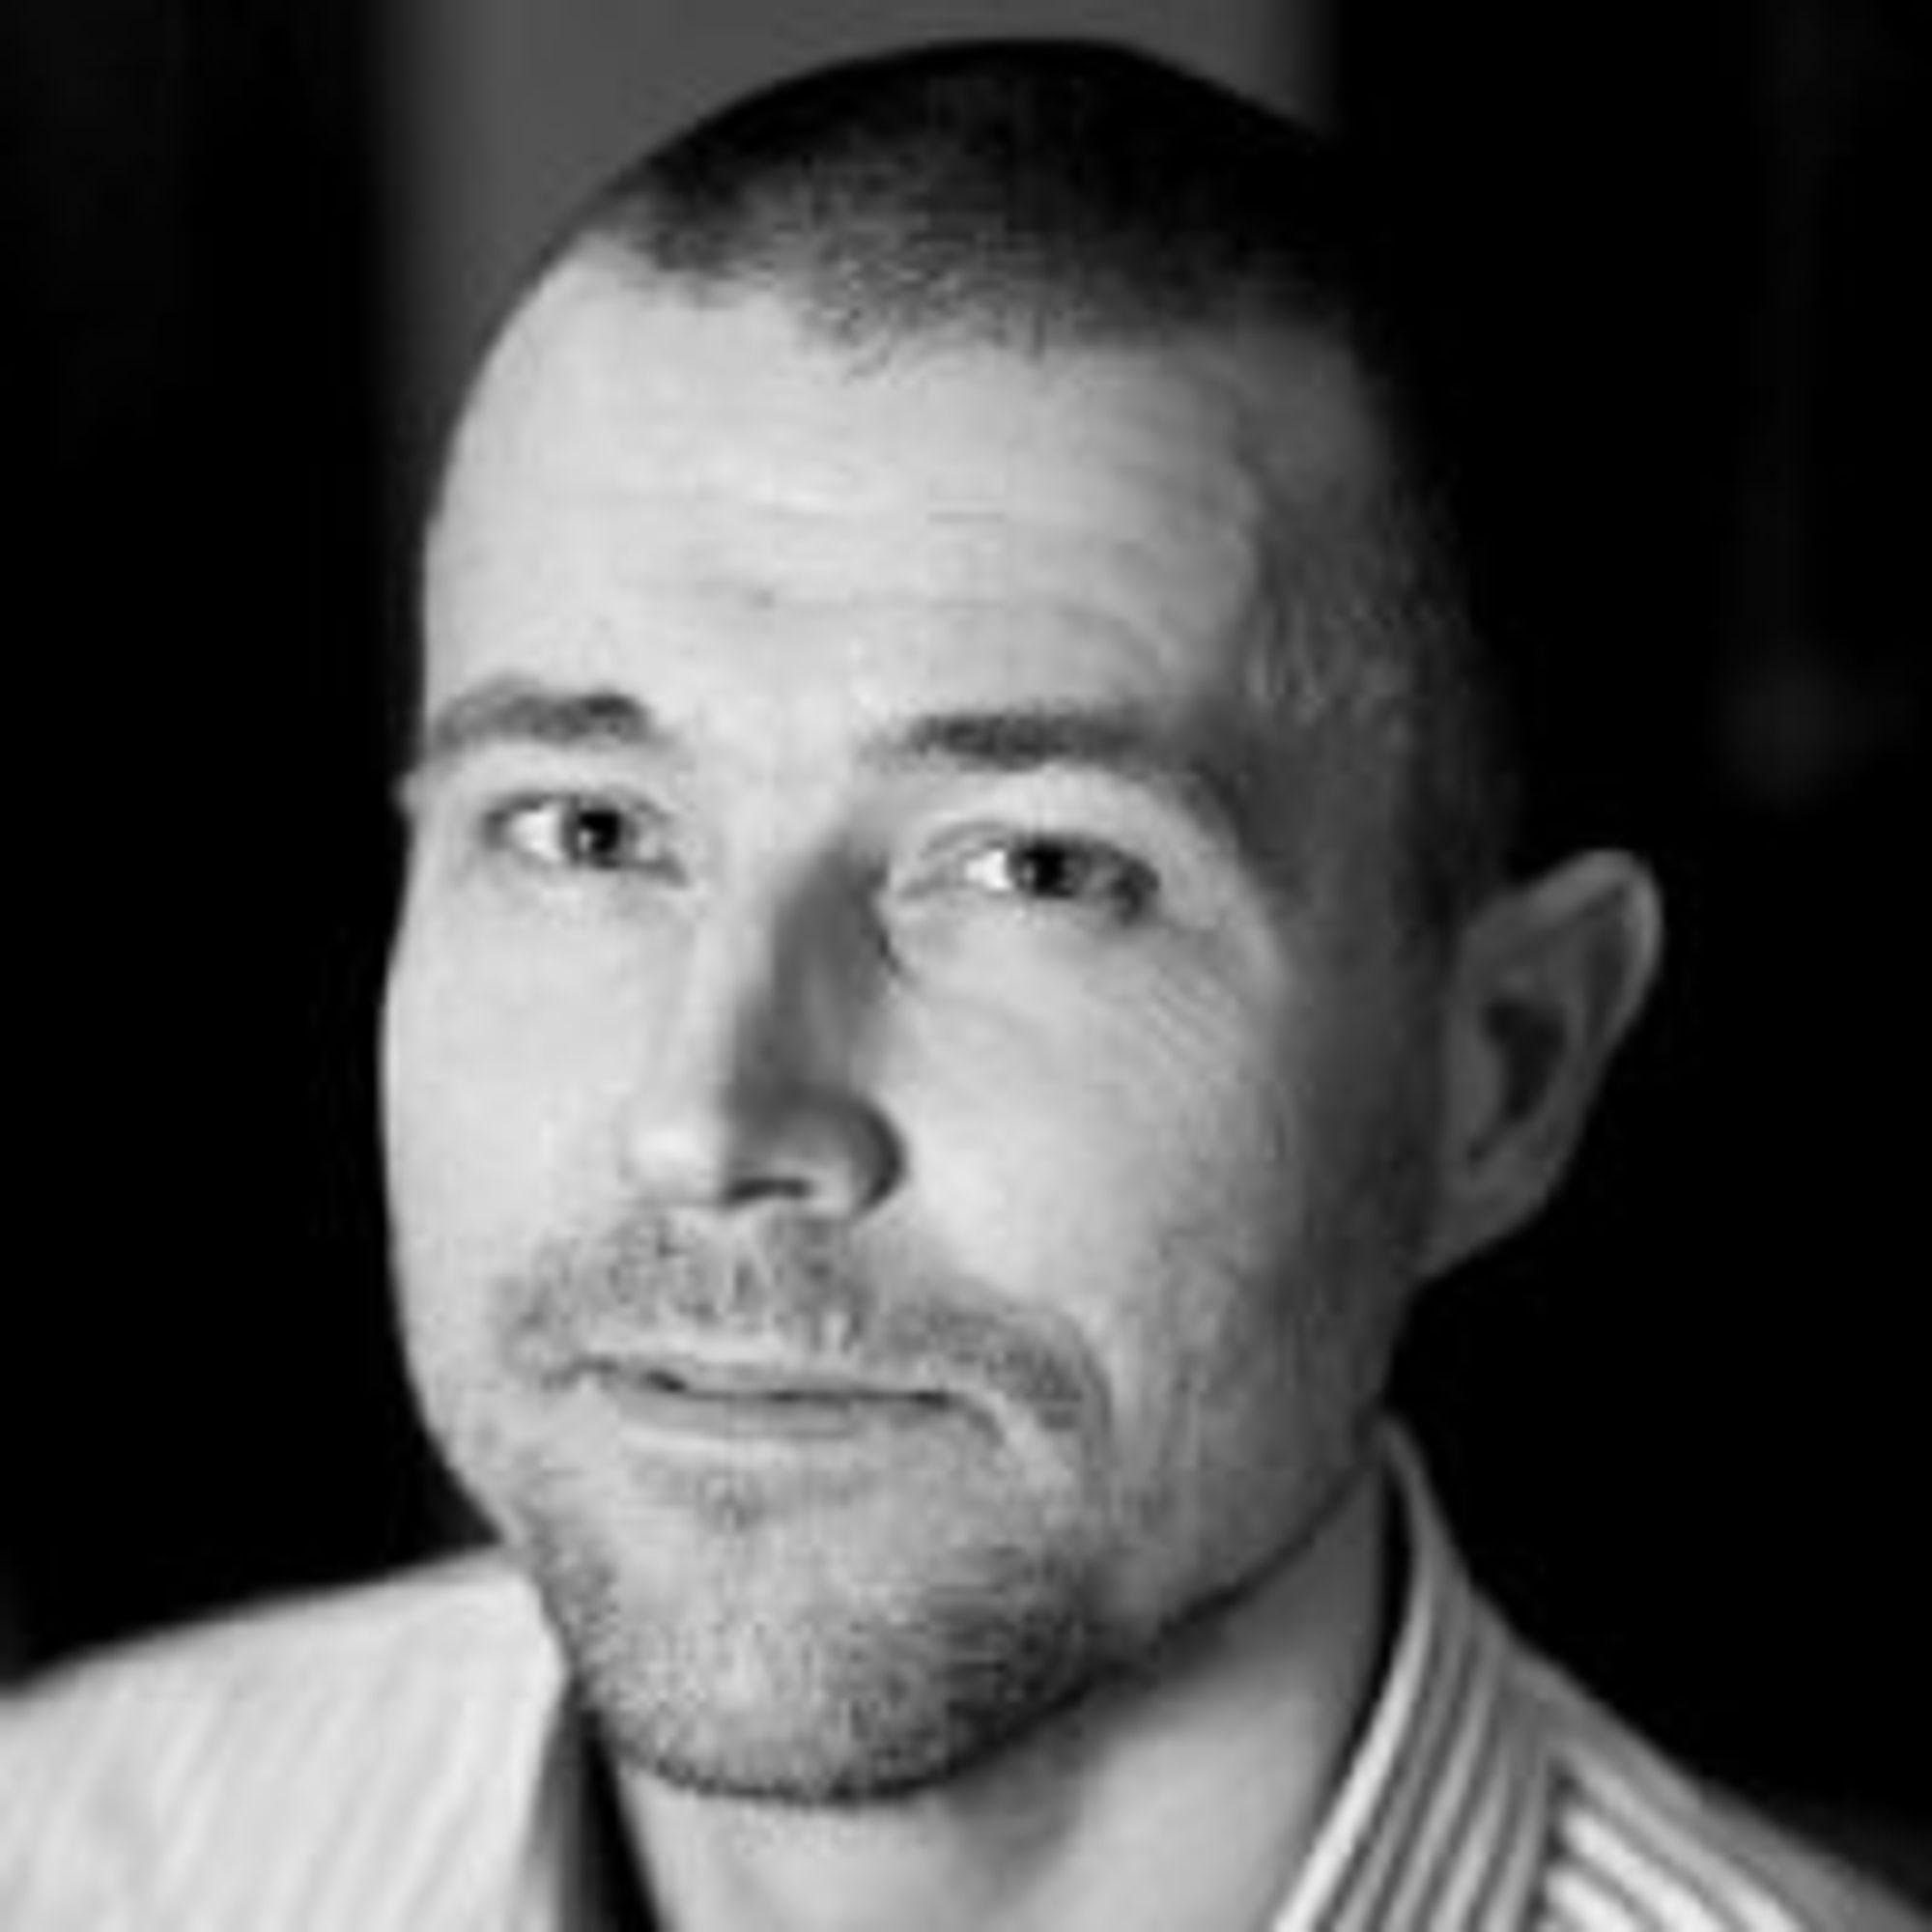 Christian Bøhn er IT-rådgiver i Trondheim kommune.